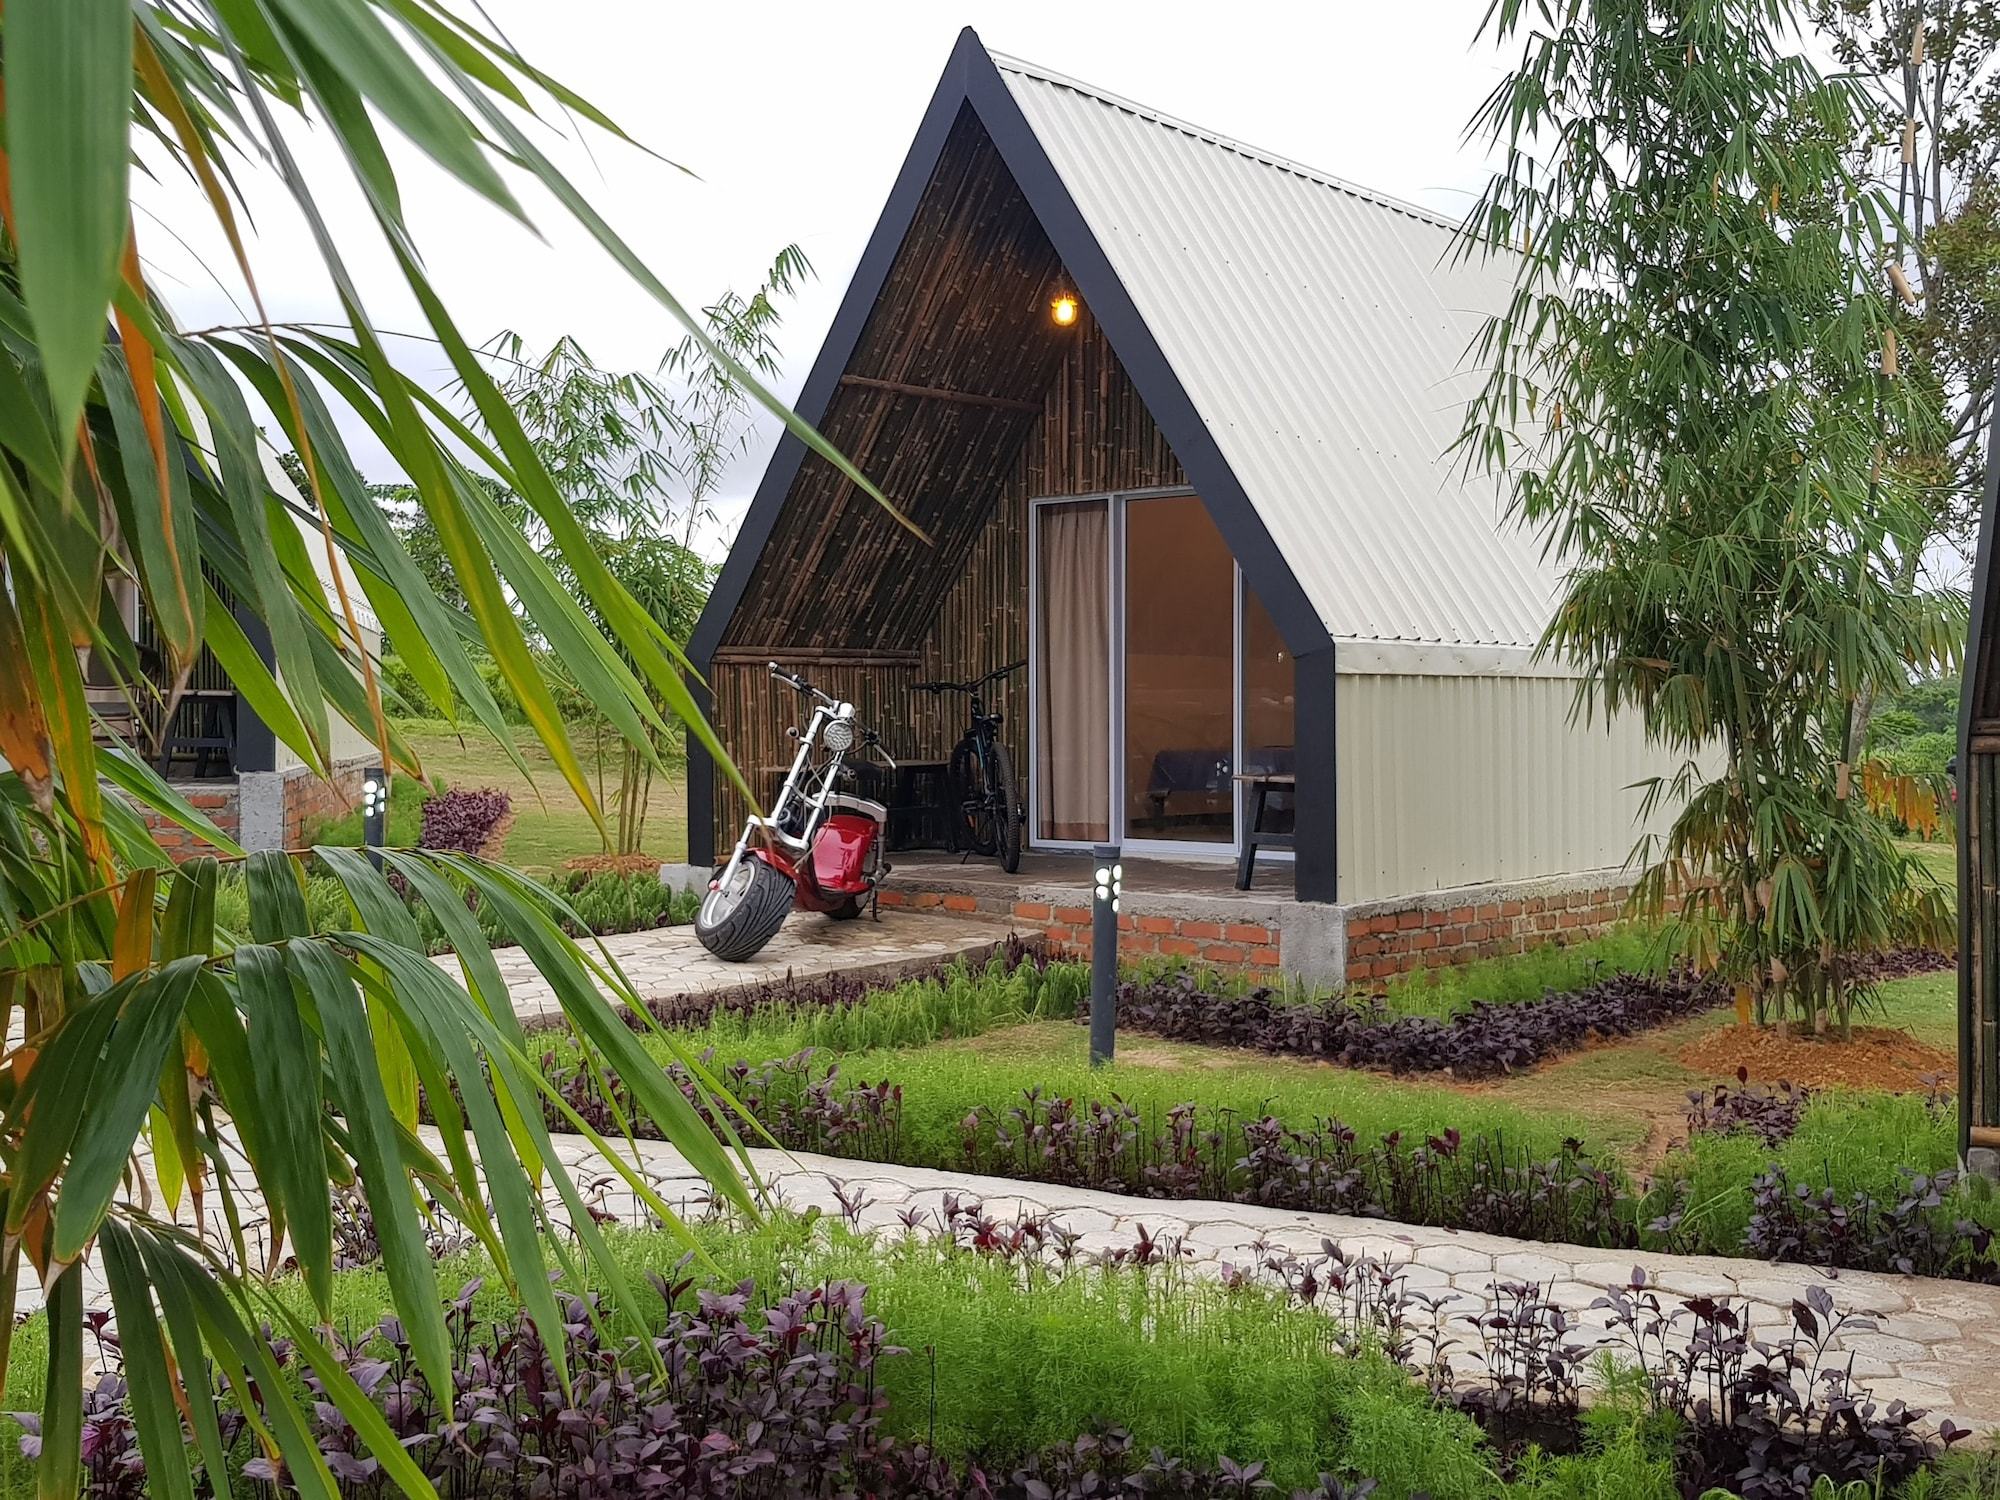 D'Bamboo Kamp Desa Wisata Ekang, Bintan